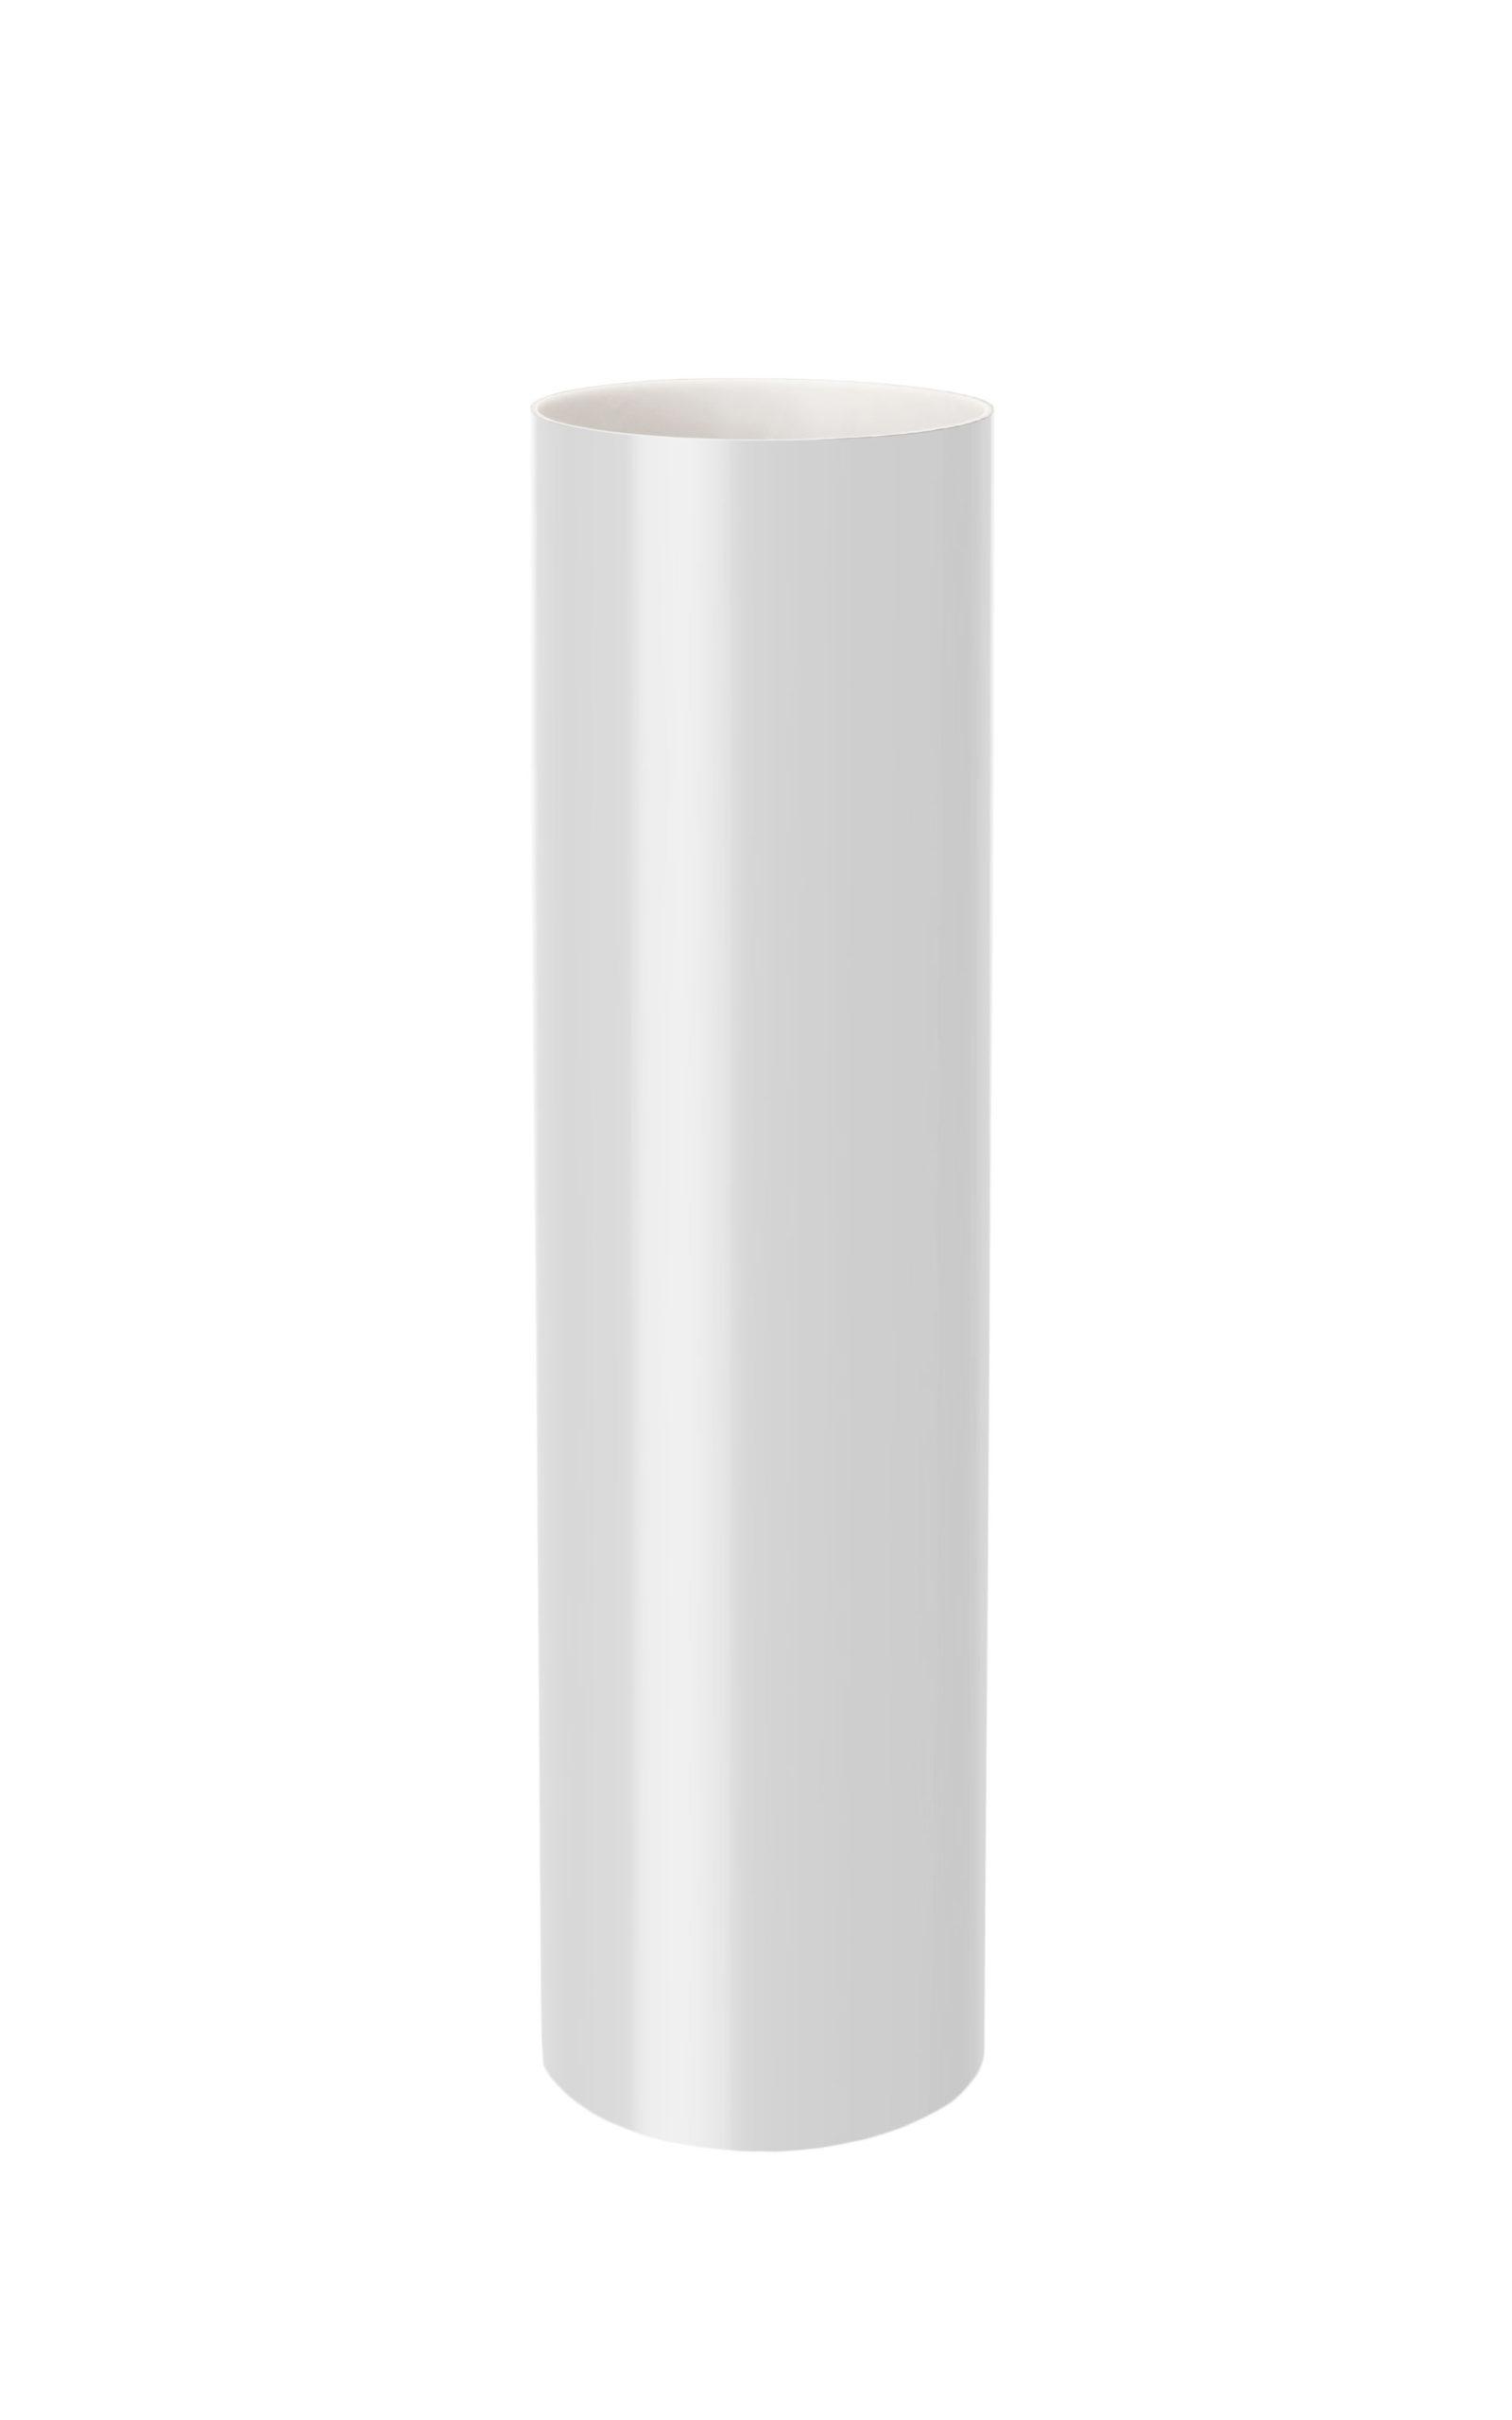 Труба, біла 85мм/Ø довжина 3м Runner